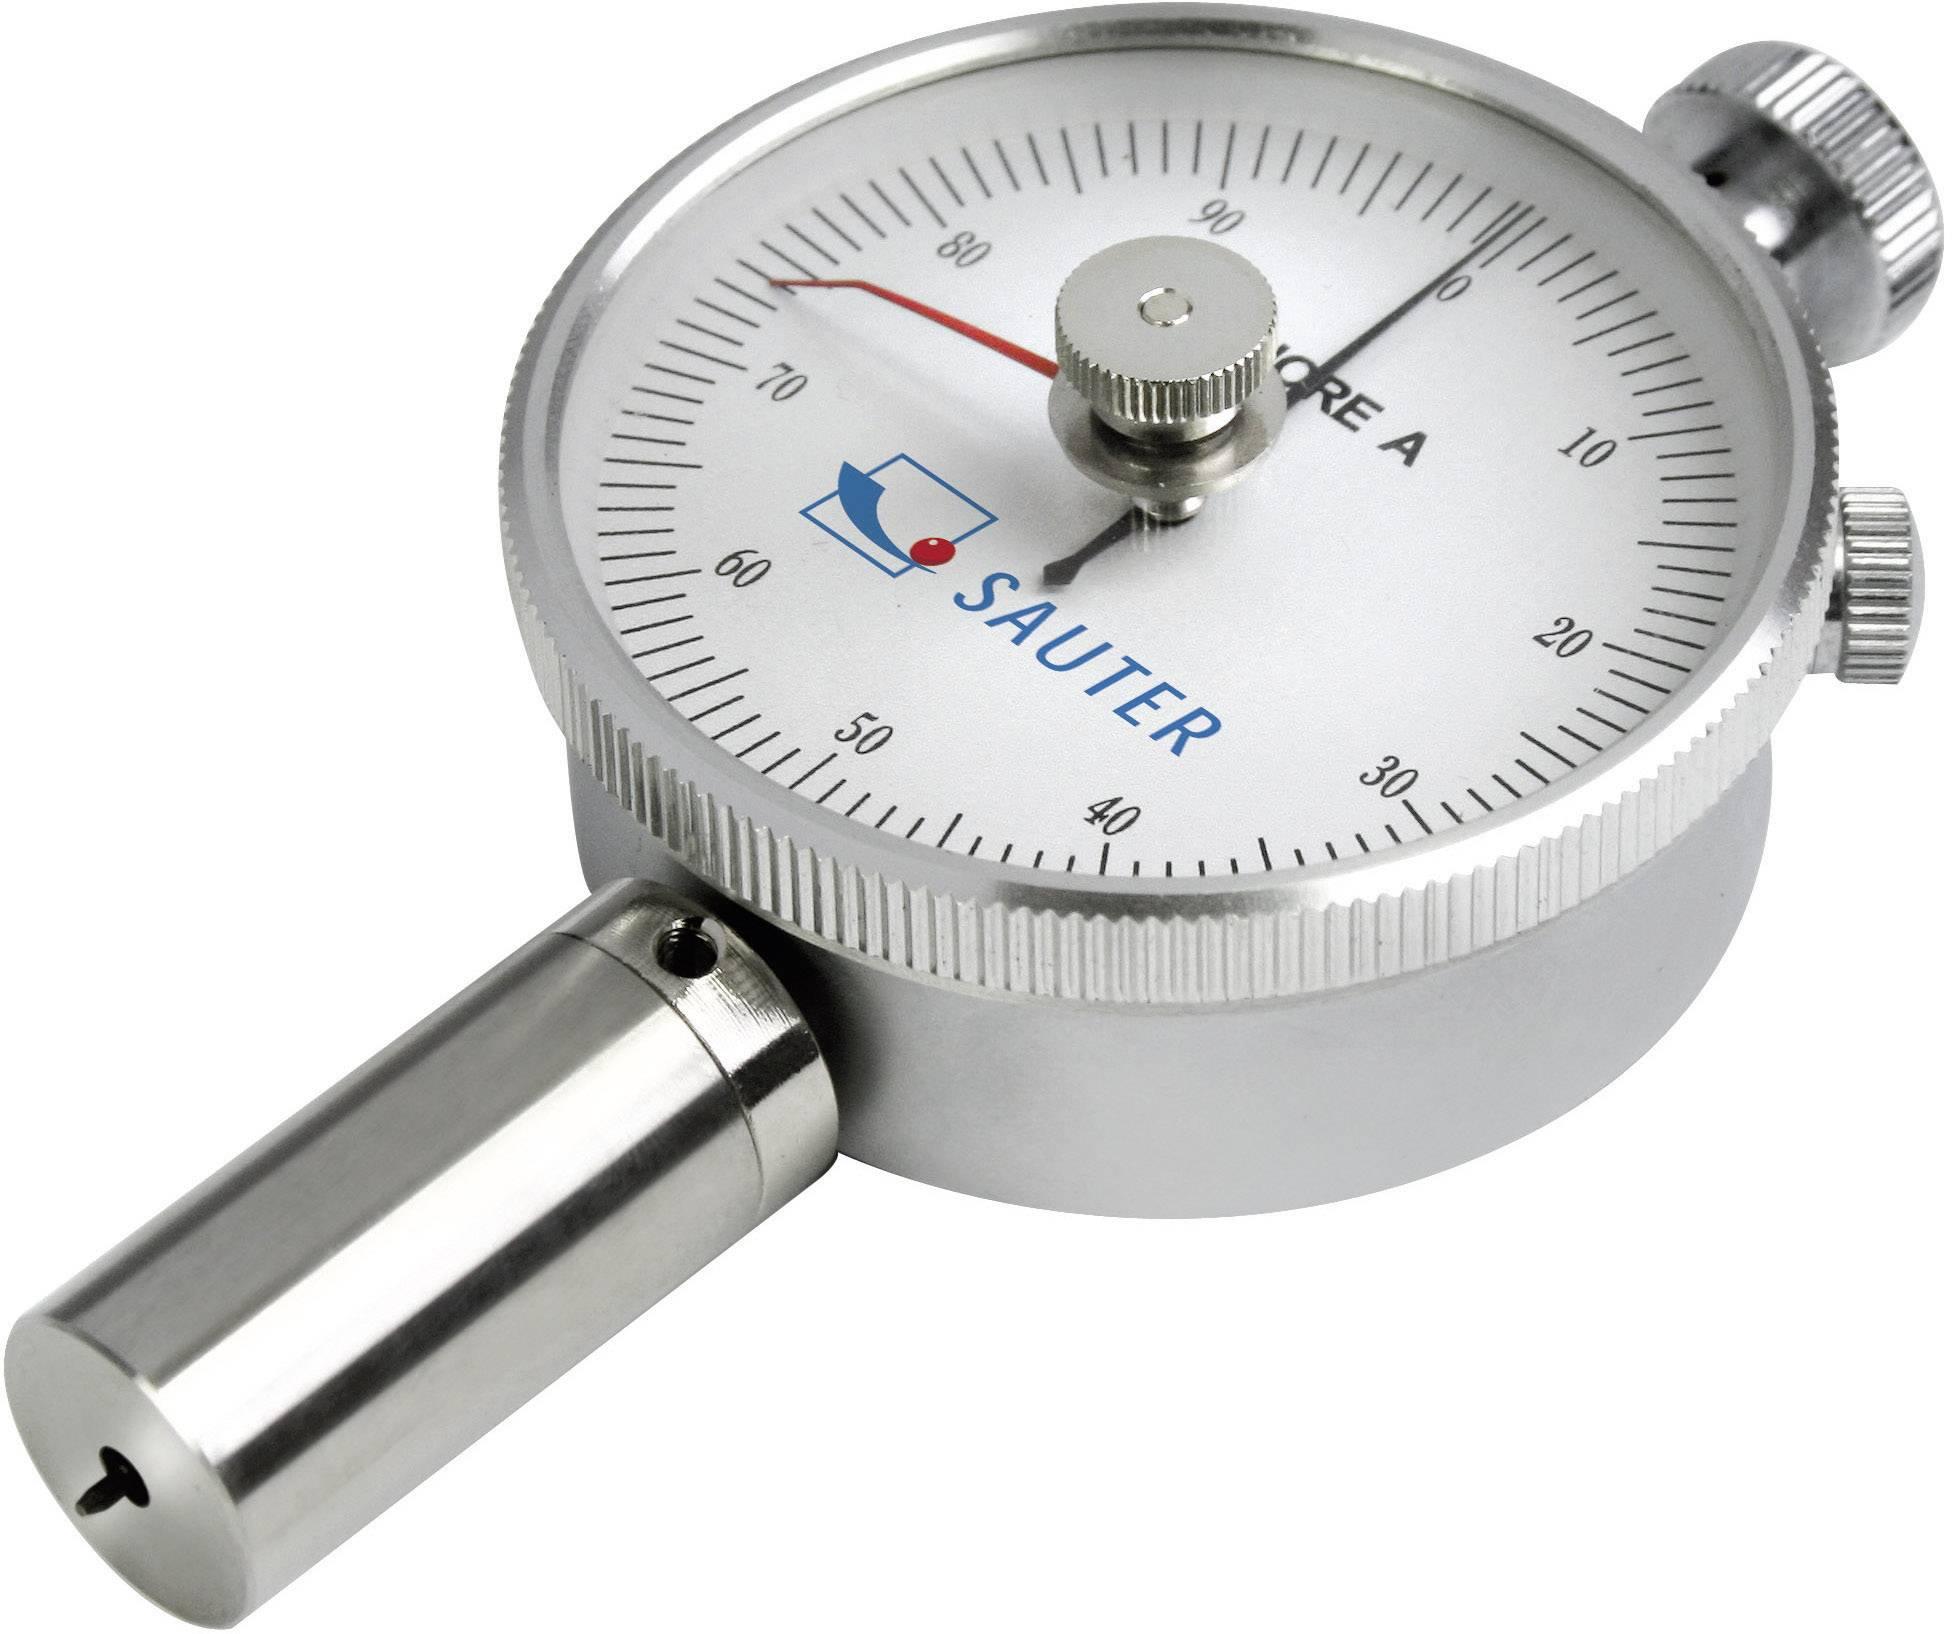 Měřič tvrdosti materiálu Sauter HBA 100-1